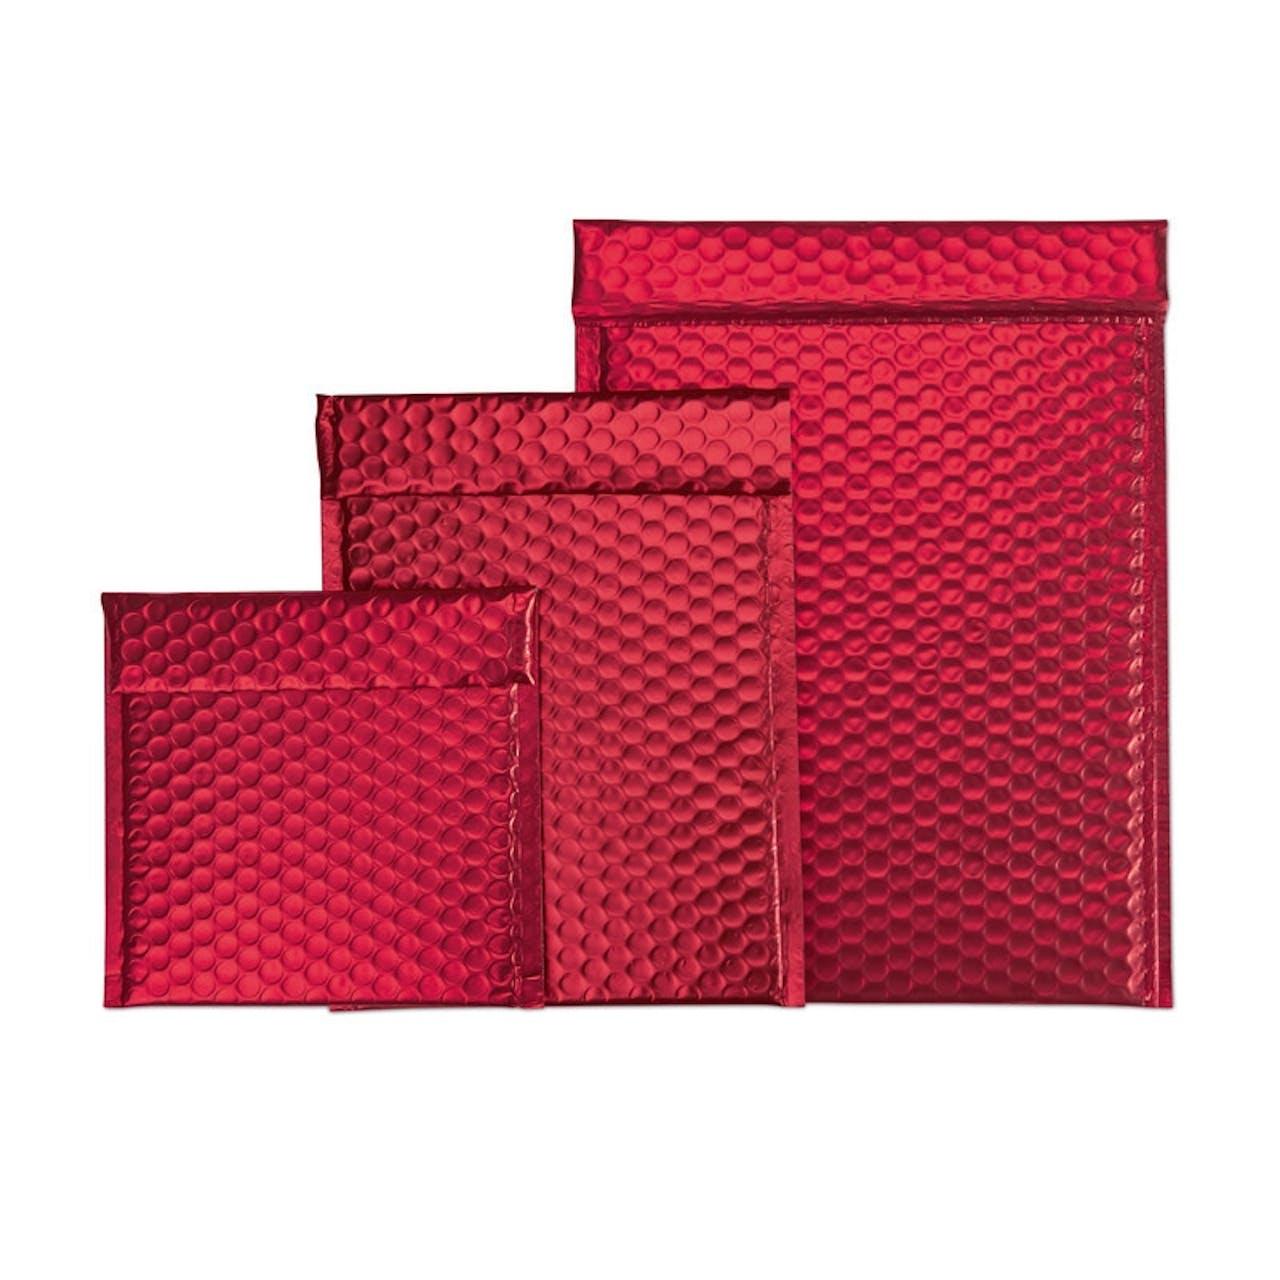 Luftpolster-Geschenktasche rot, VAR: lg02-13